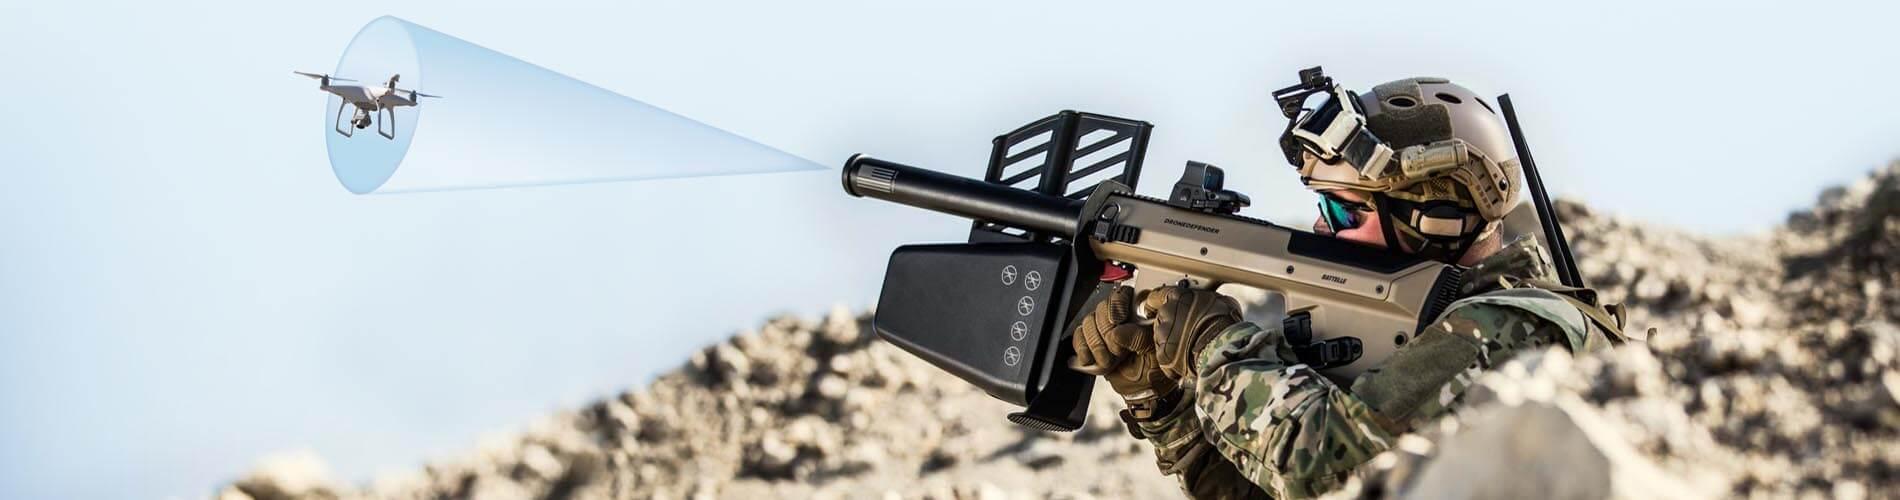 ihasavar, anti-drone, iha karşıtı sistem